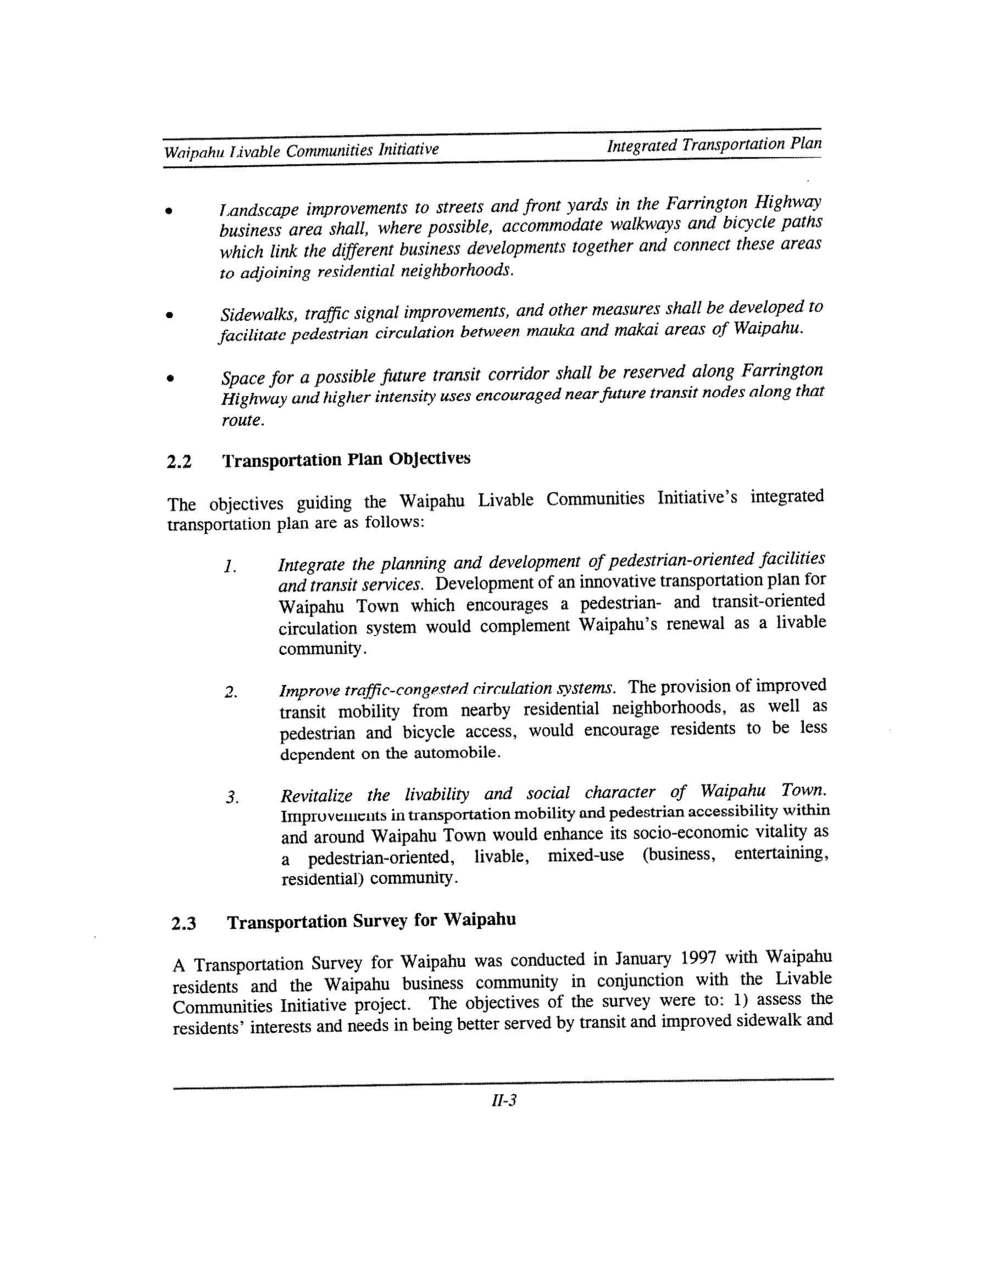 160531_WaipahuLivableCommunities(1998)_Page_018.jpg